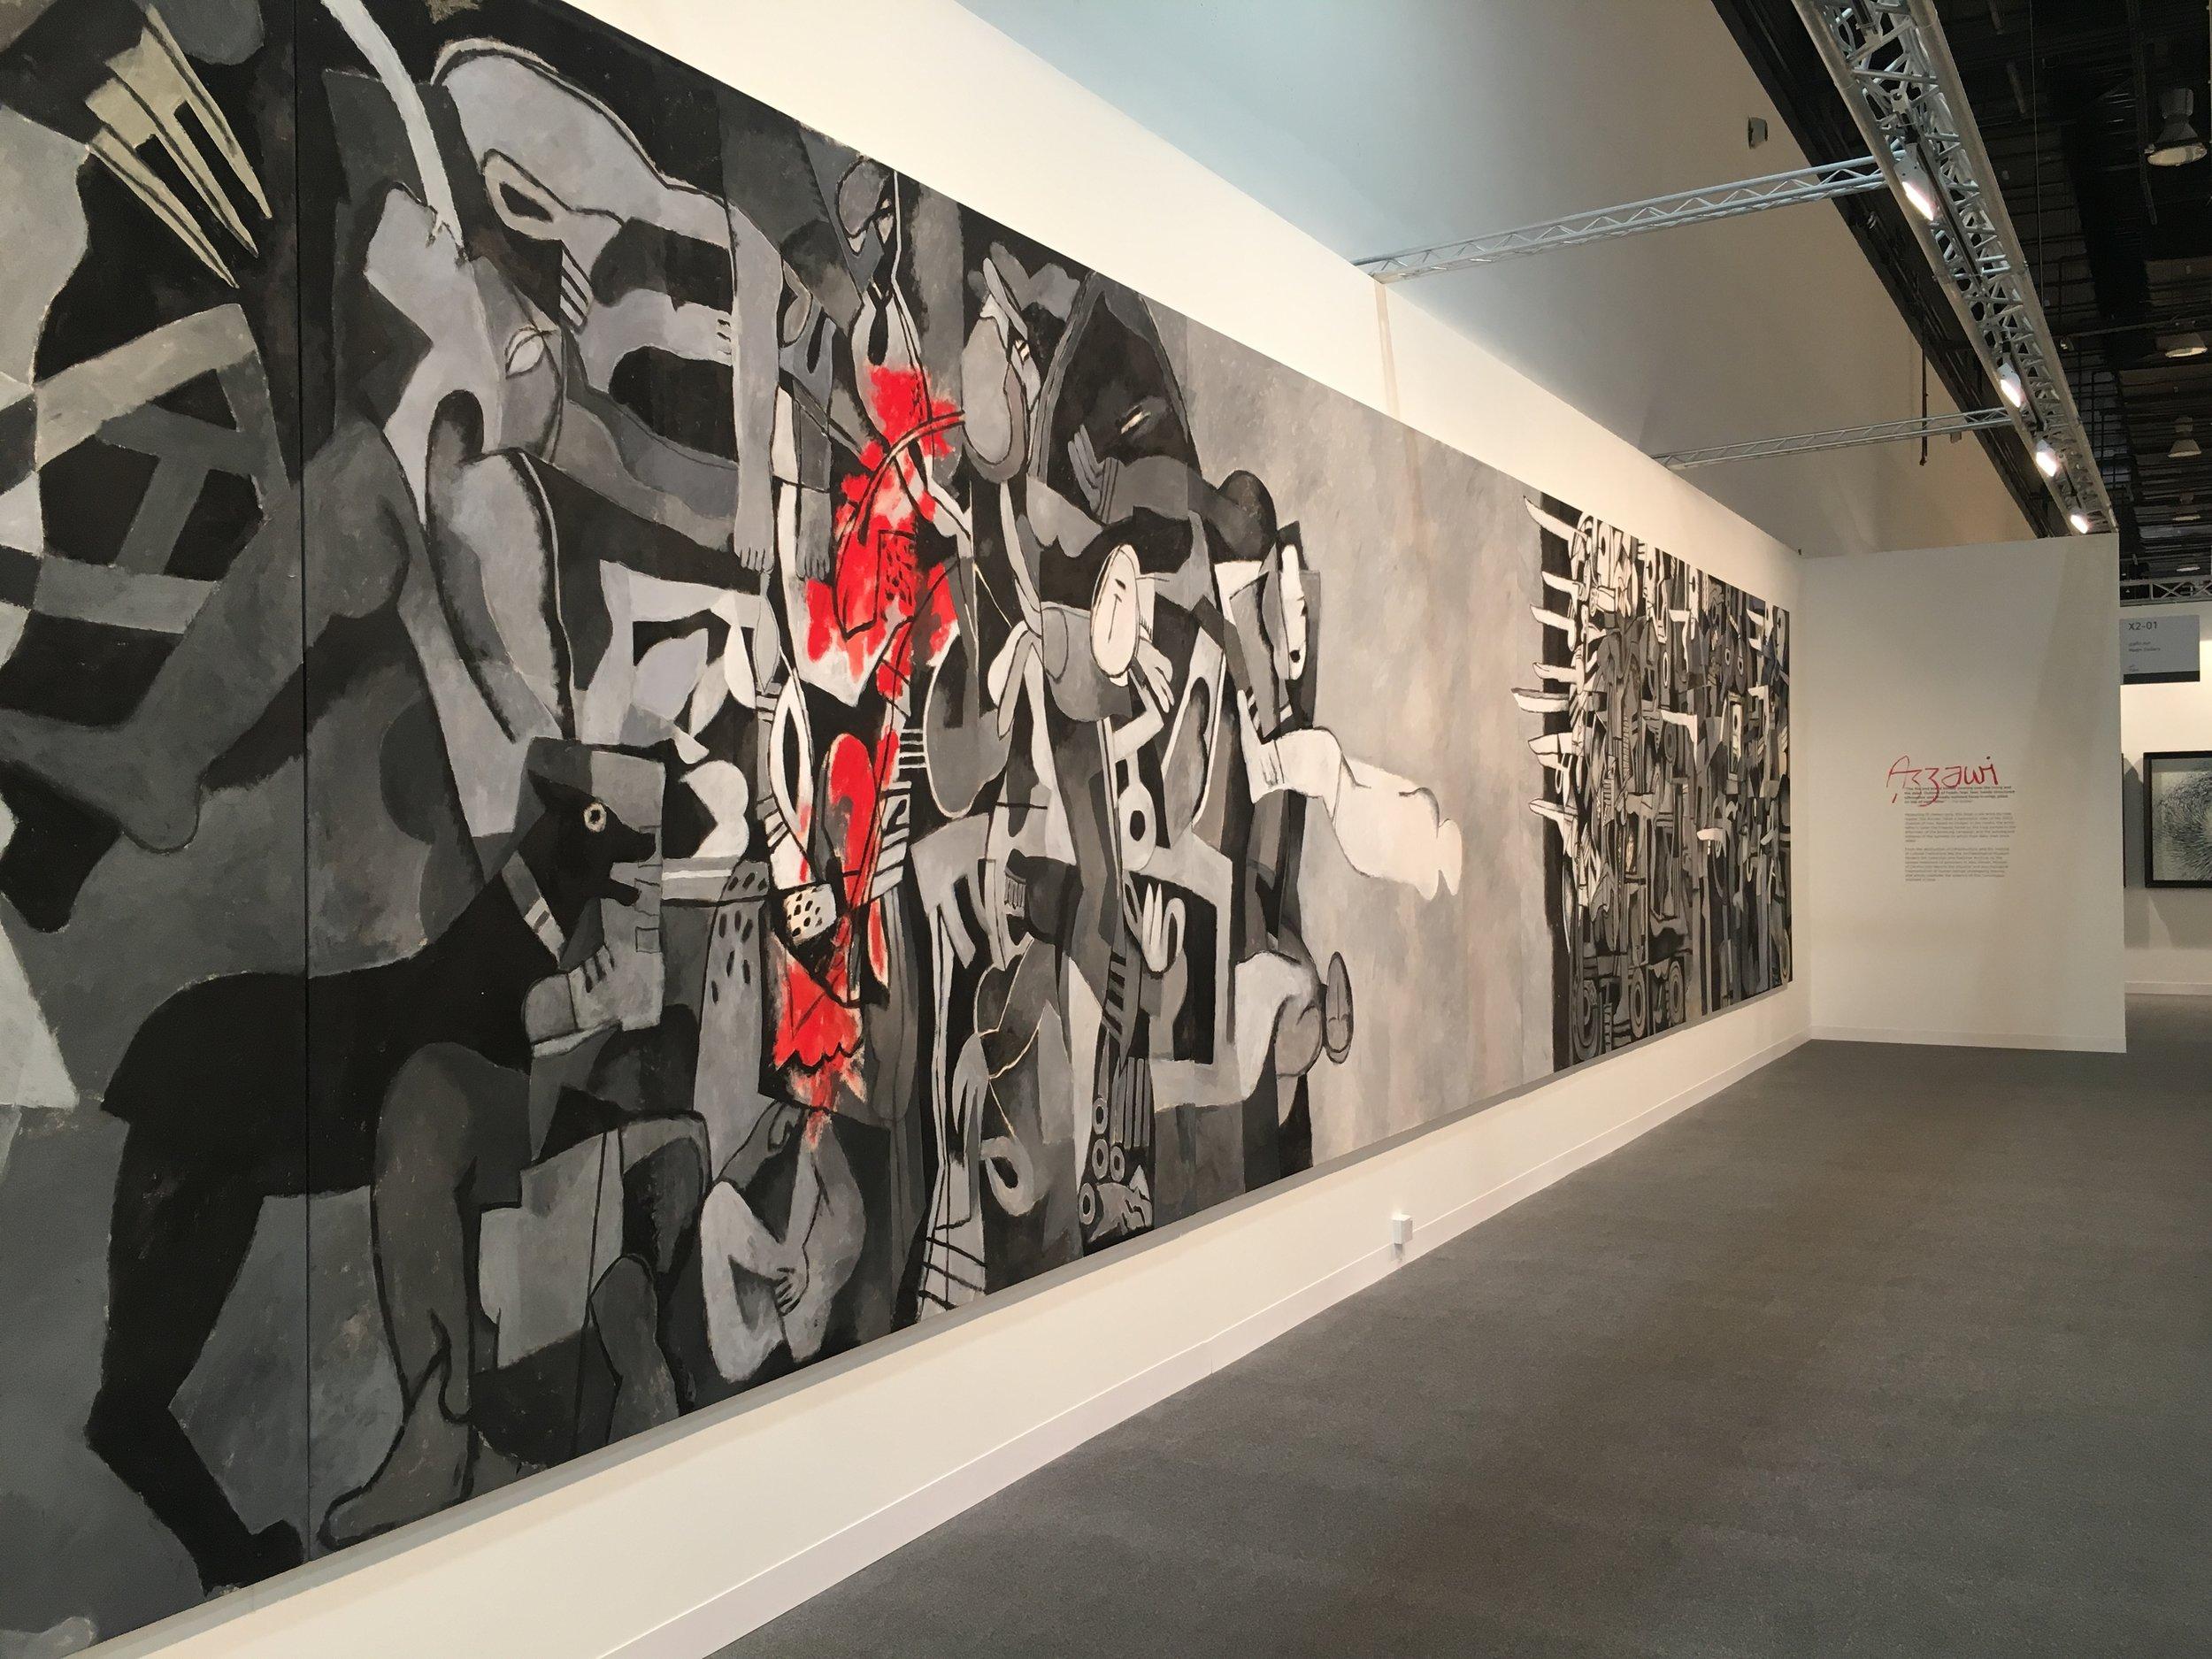 Dia Azzawi. Mission of Destruction. 2004–2007.Acrylic on canvas,200cm x 1500cm. Image taken by Anna Seaman at Abu Dhabi Art, 2017.